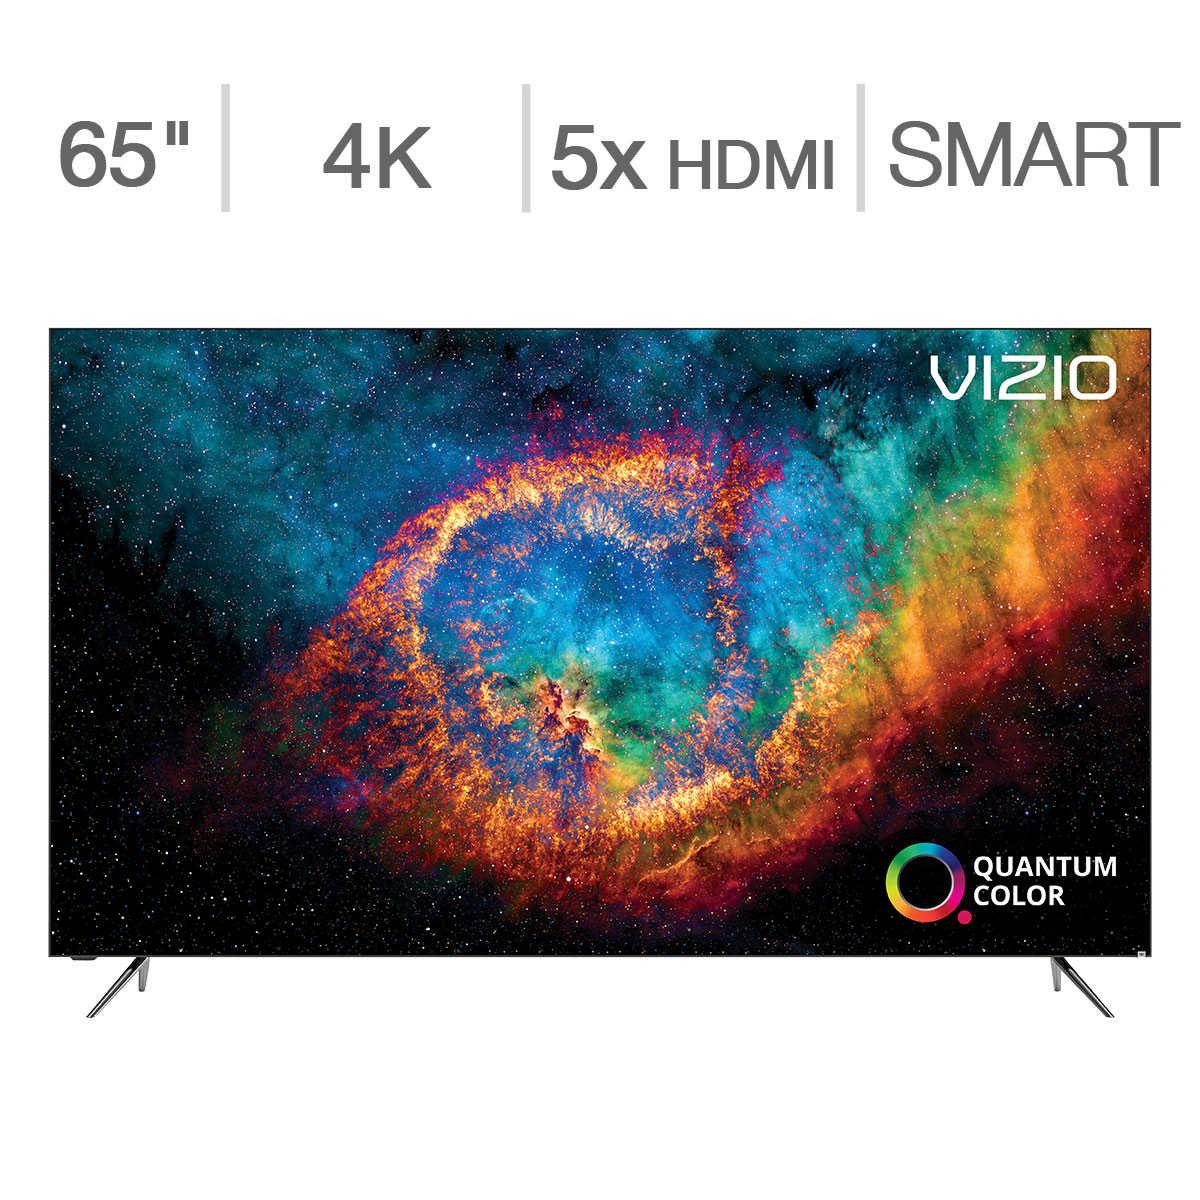 Vizio 65 Class - PX-Series - 4K UHD Quantum LED LCD TV $980 $979.99